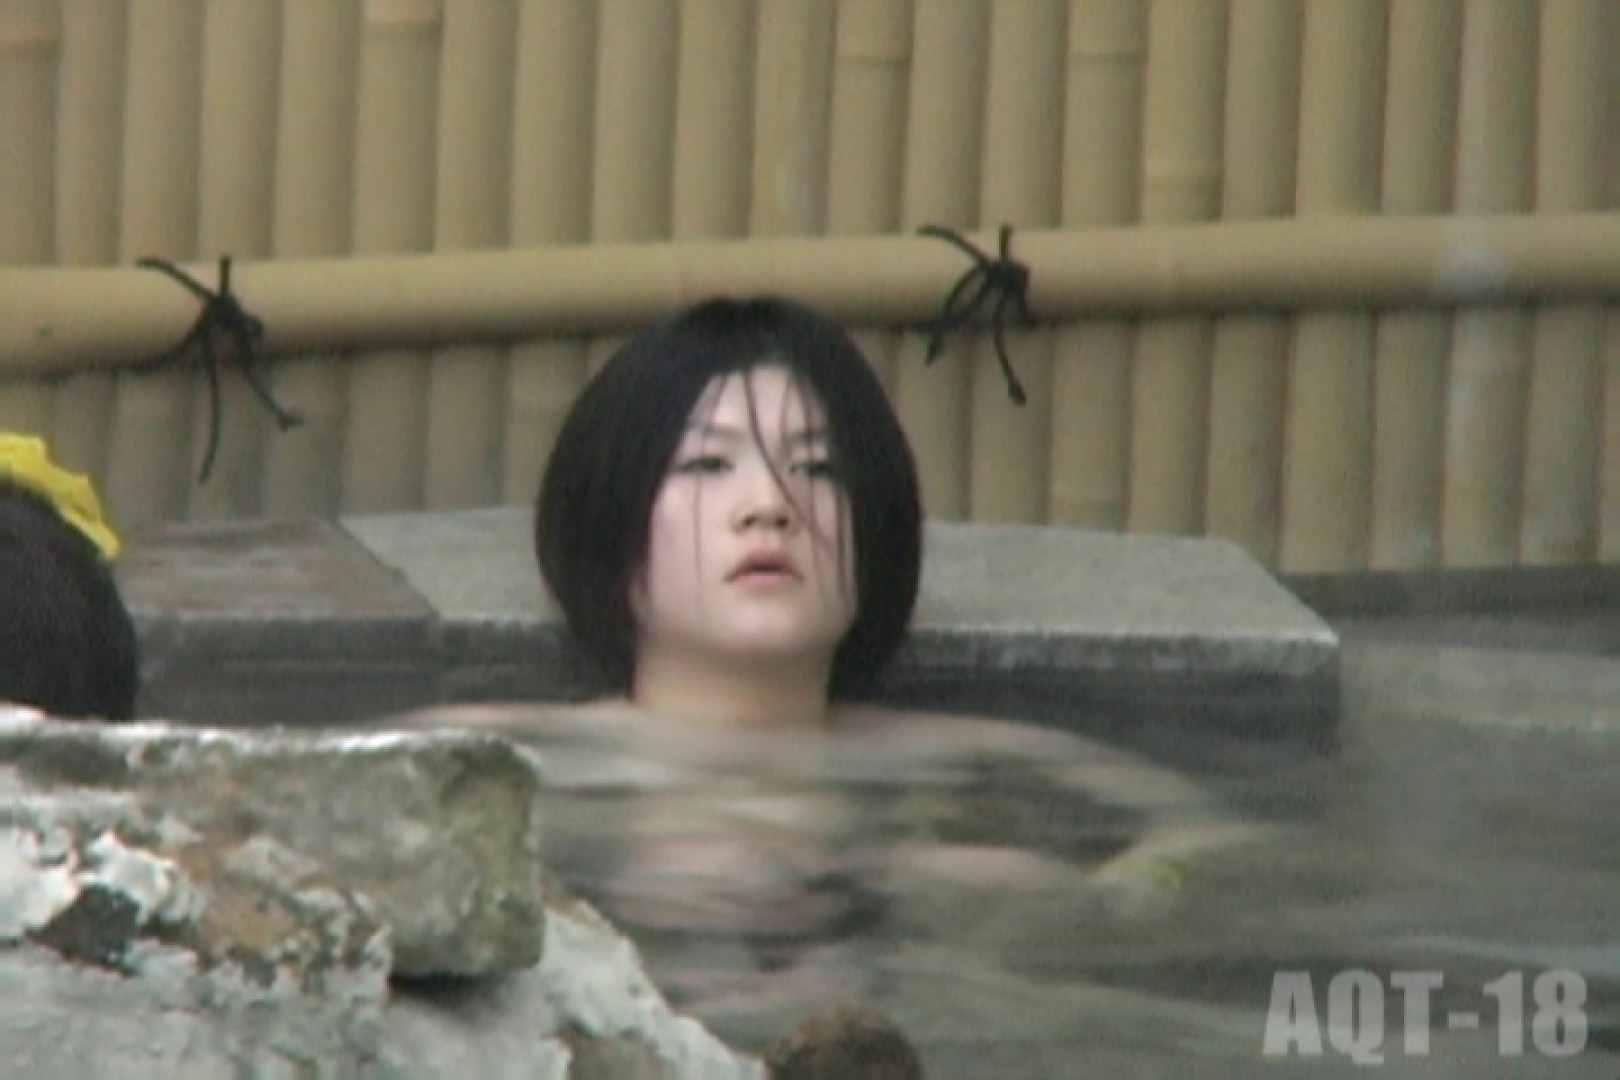 Aquaな露天風呂Vol.859 露天風呂編  76PIX 14